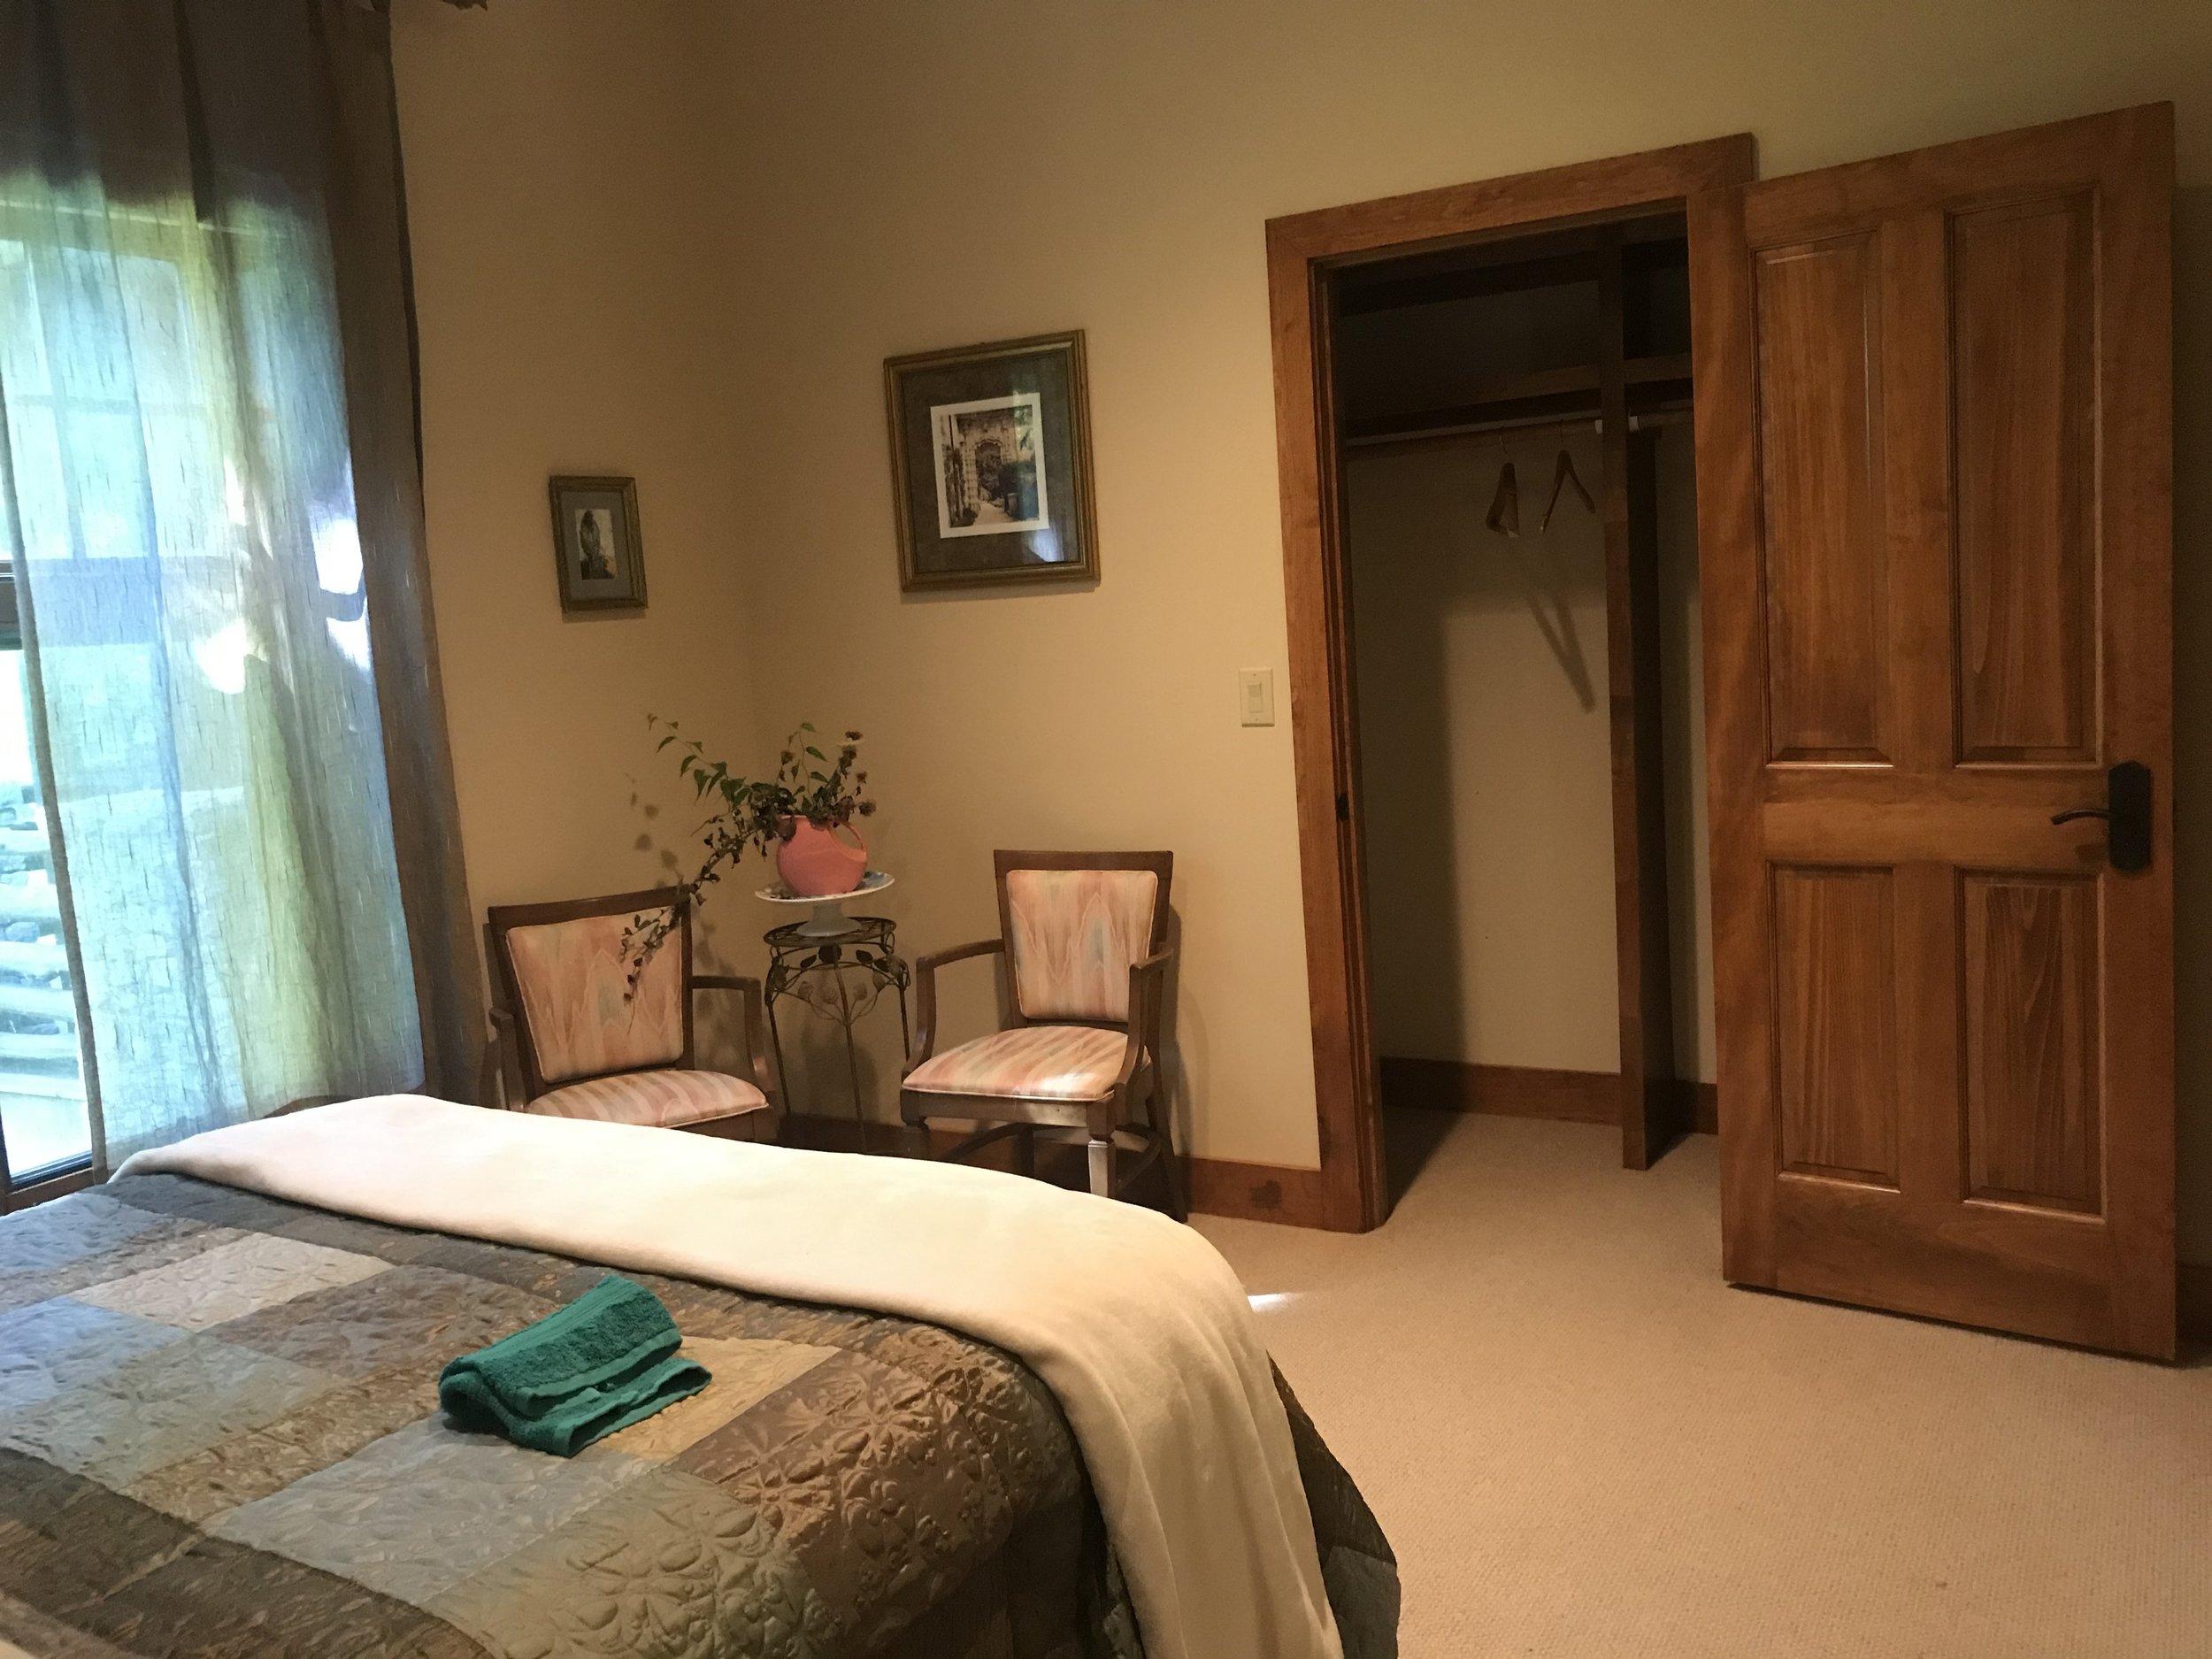 L L2 bed with open closet.JPG